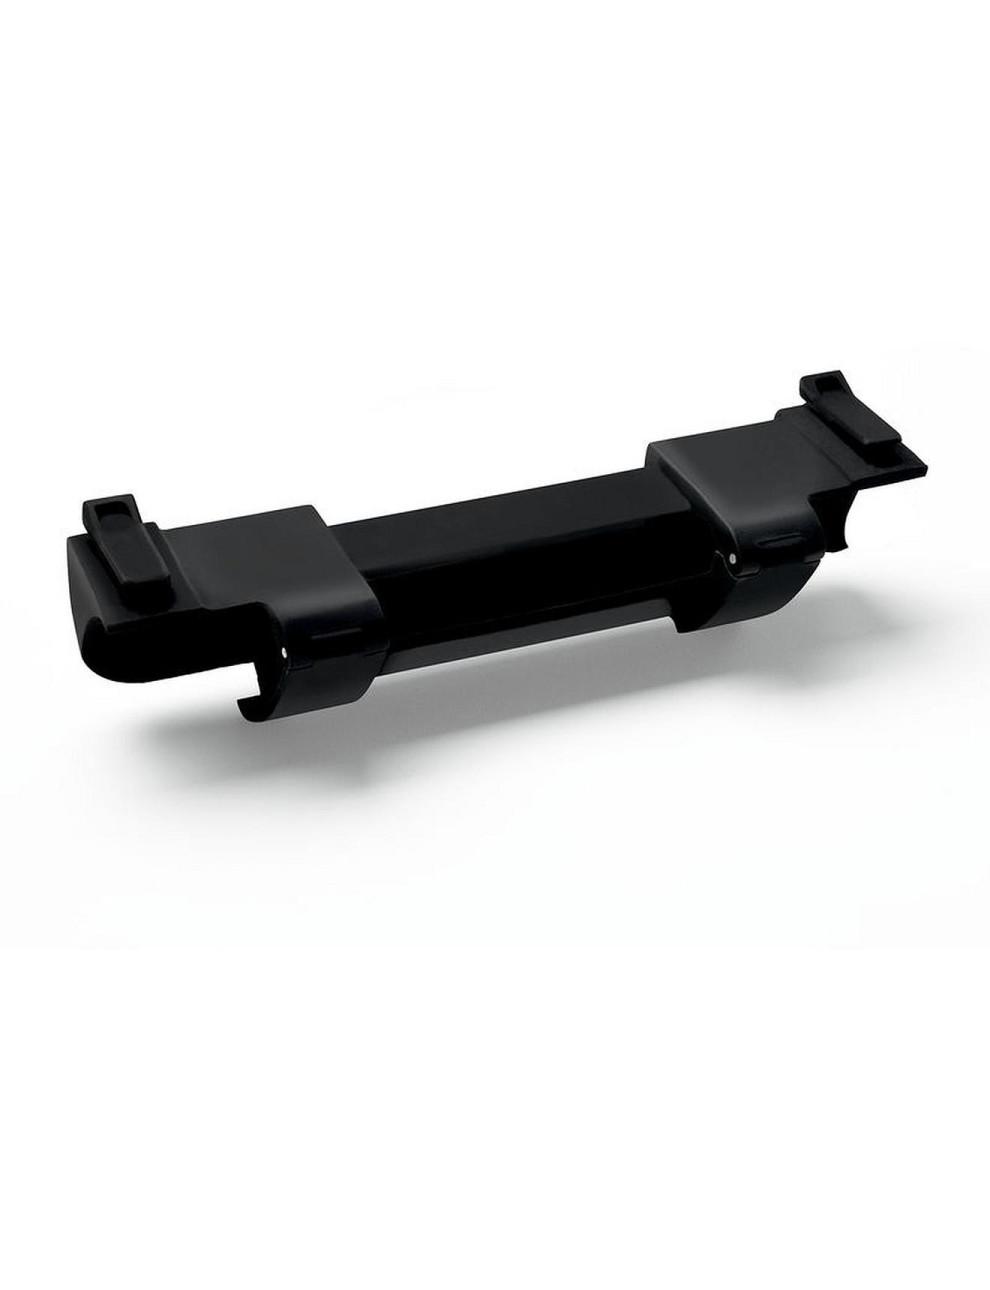 Adapteur Bugaboo Buffalo/Donkey pour Planche Confort a Roulettes